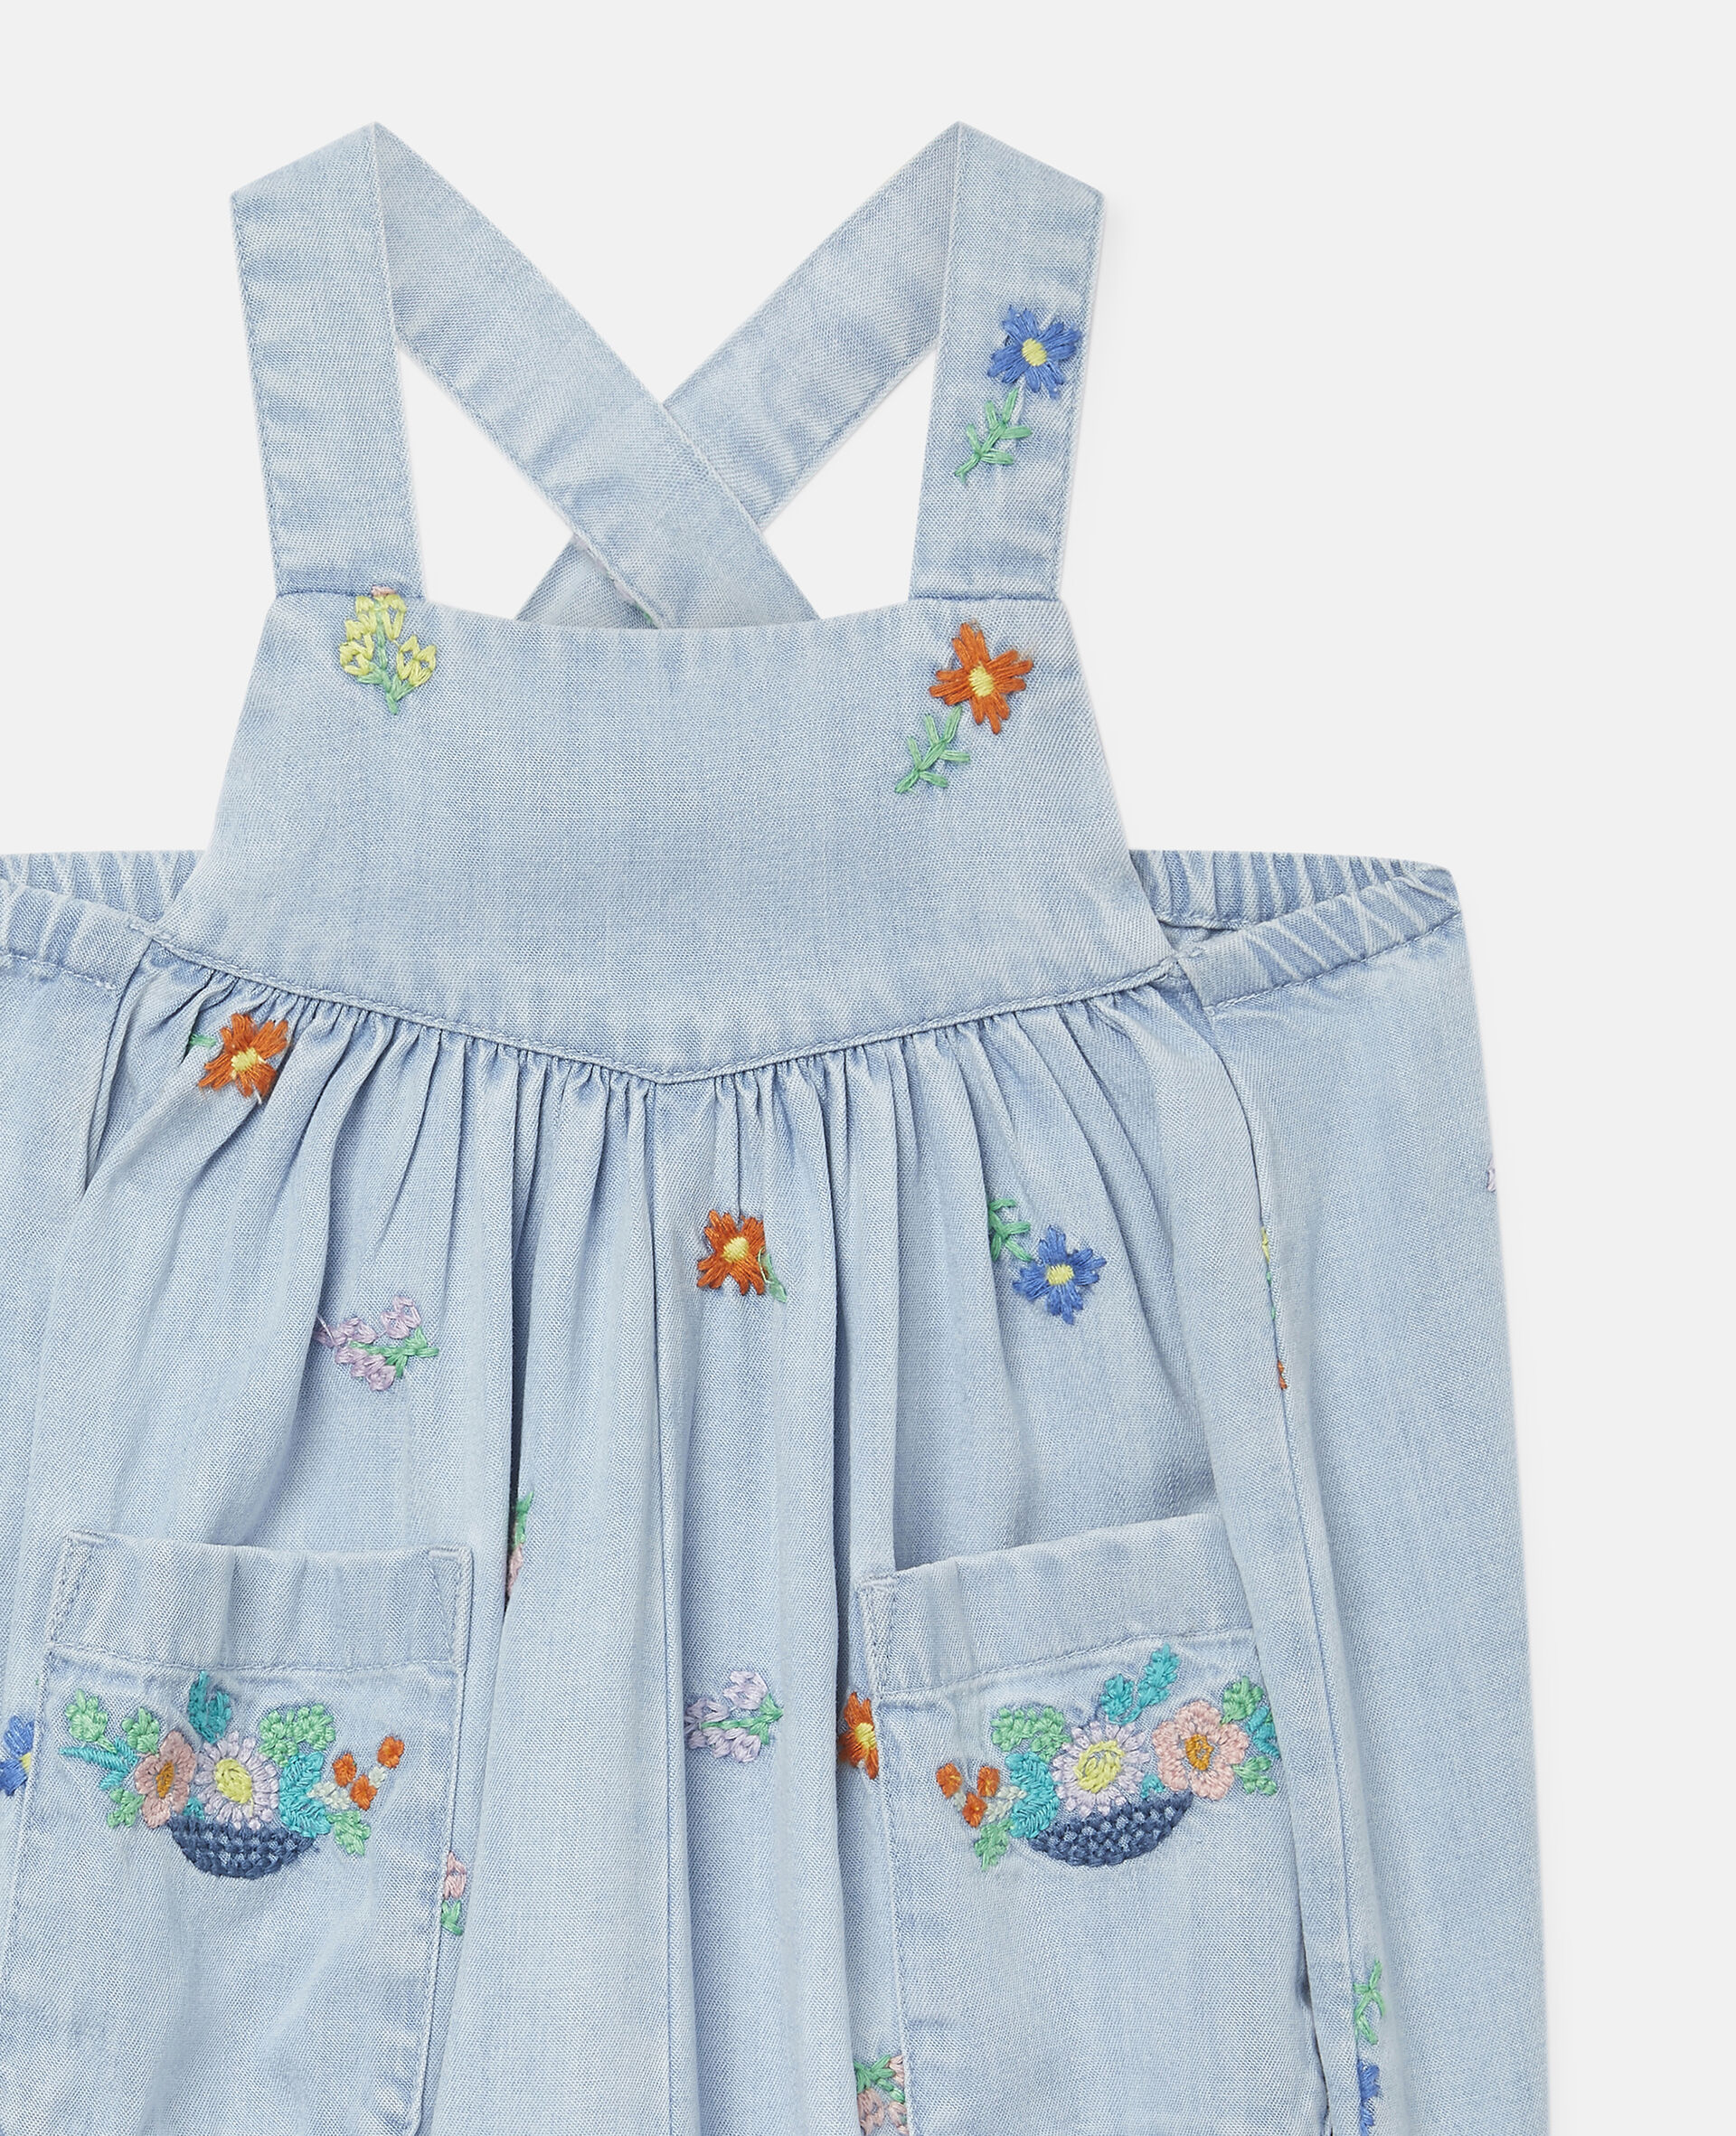 Embroidered Flowers Denim Dungarees-Blue-large image number 2